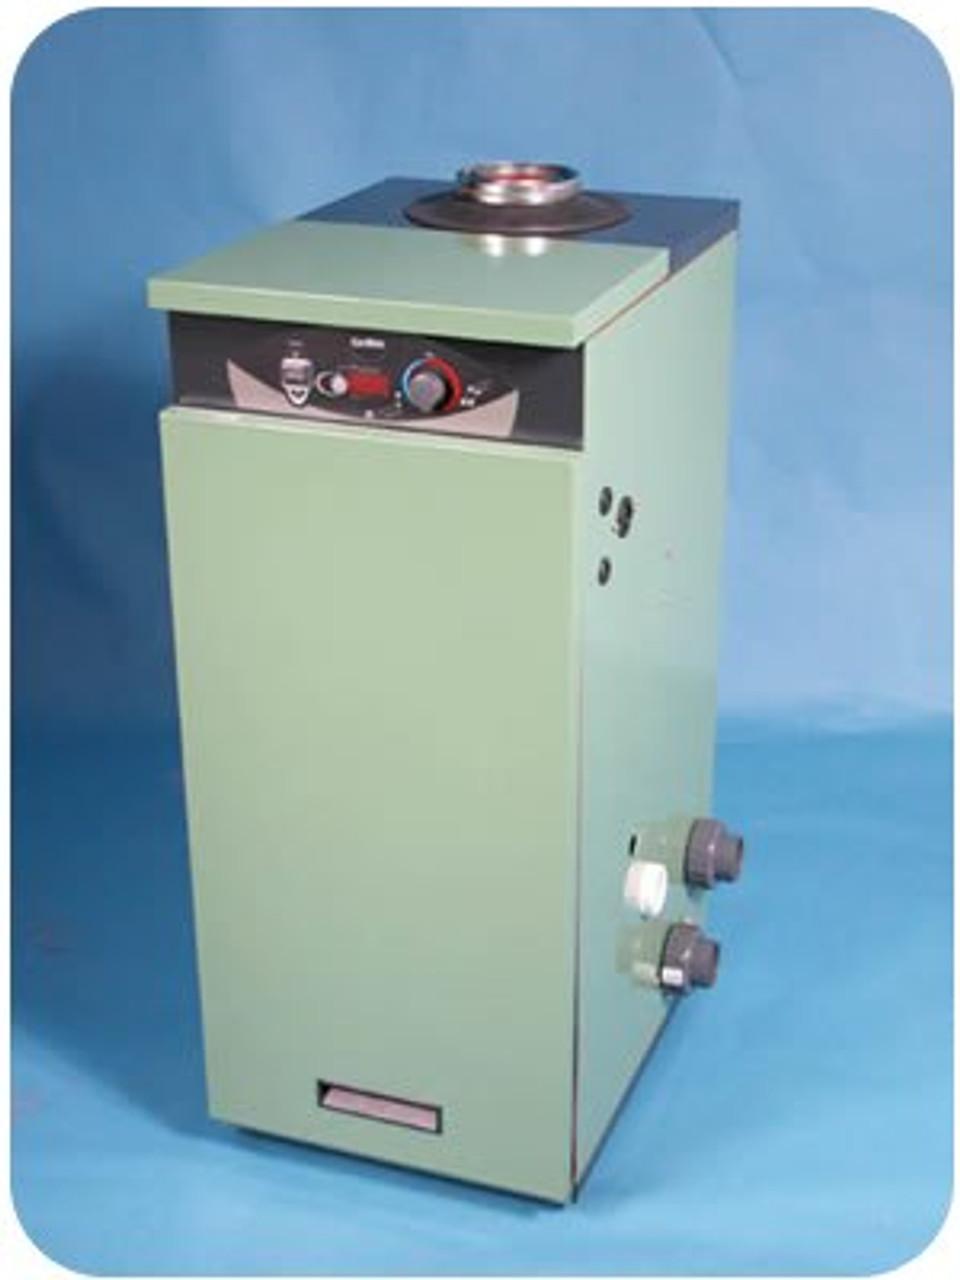 Certikin Genie Condensing Boiler swimming pool heater